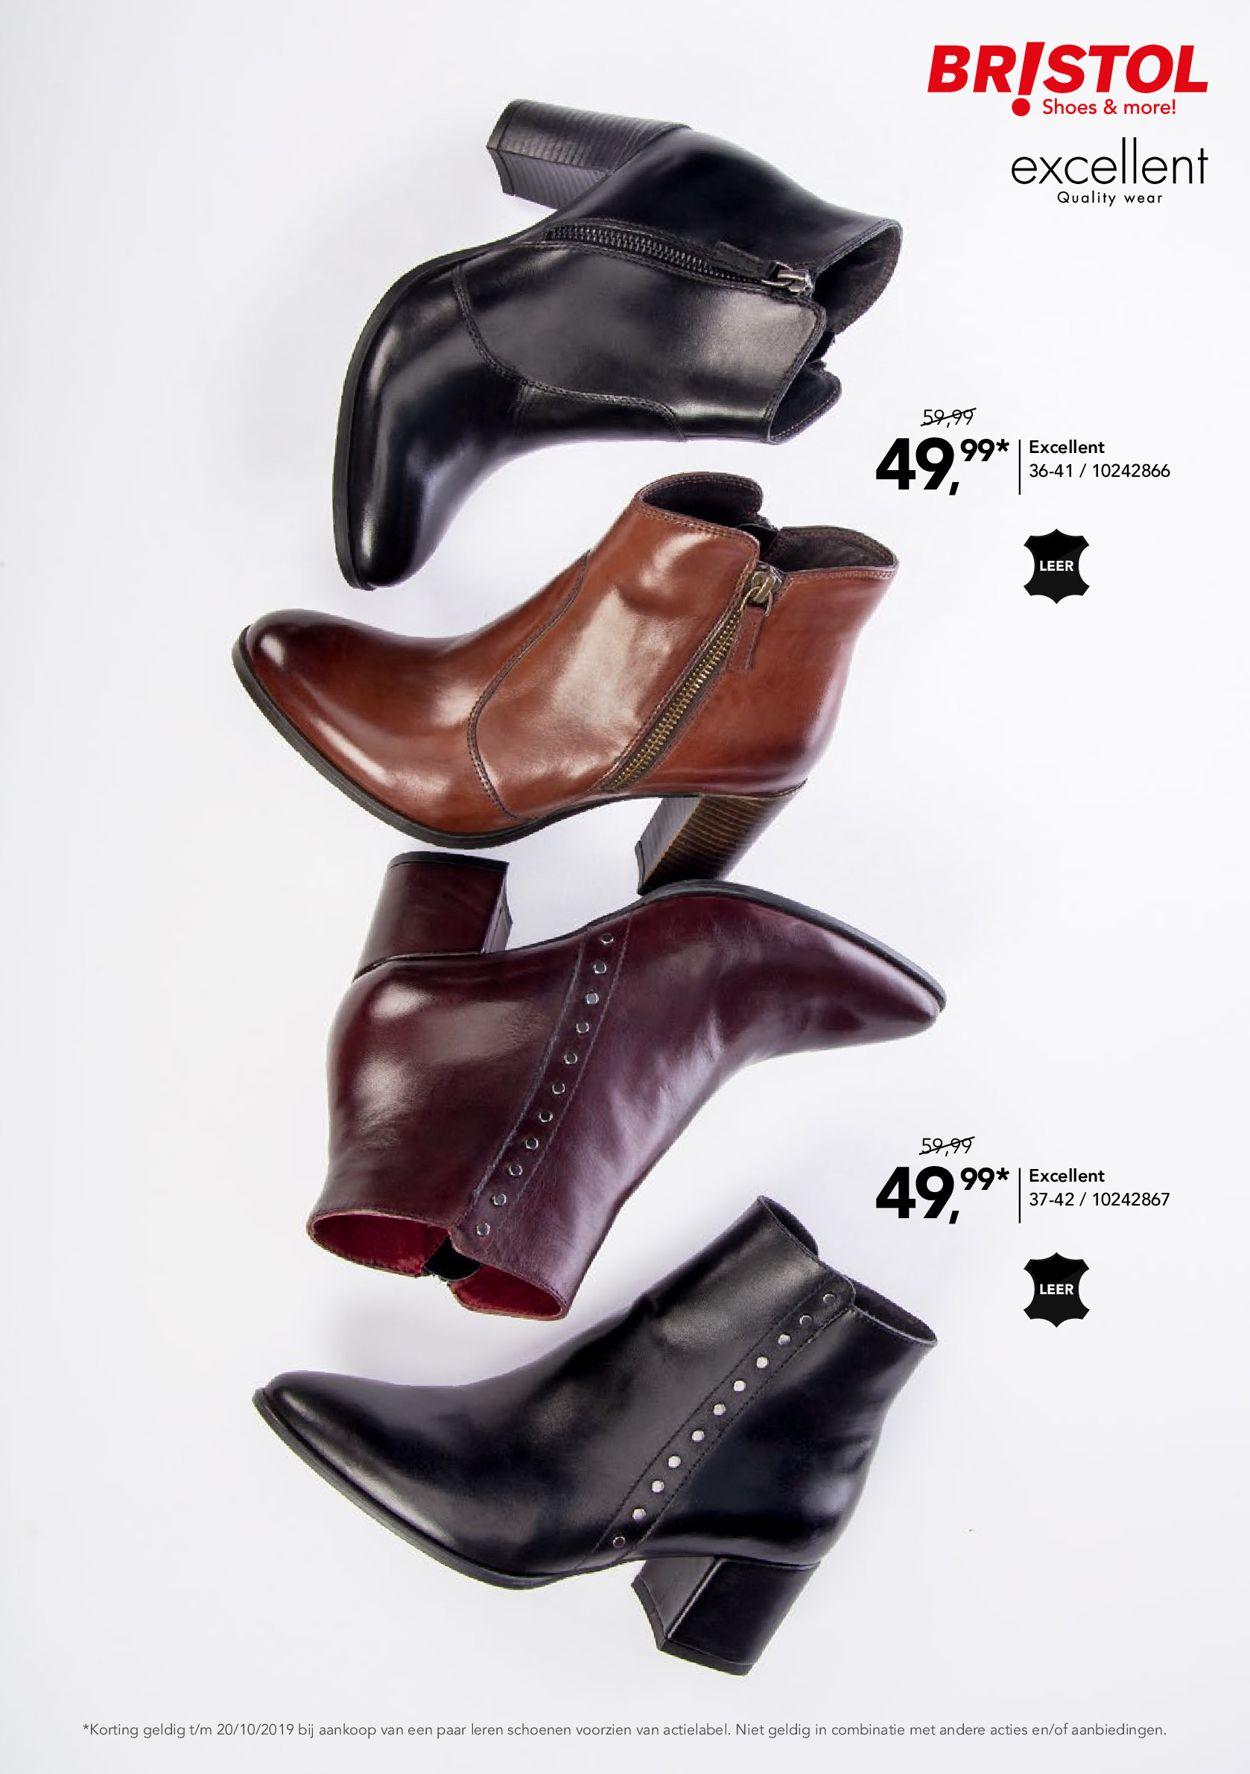 Bristol aanbieding: Dames laarzen Excellent Quality Wear